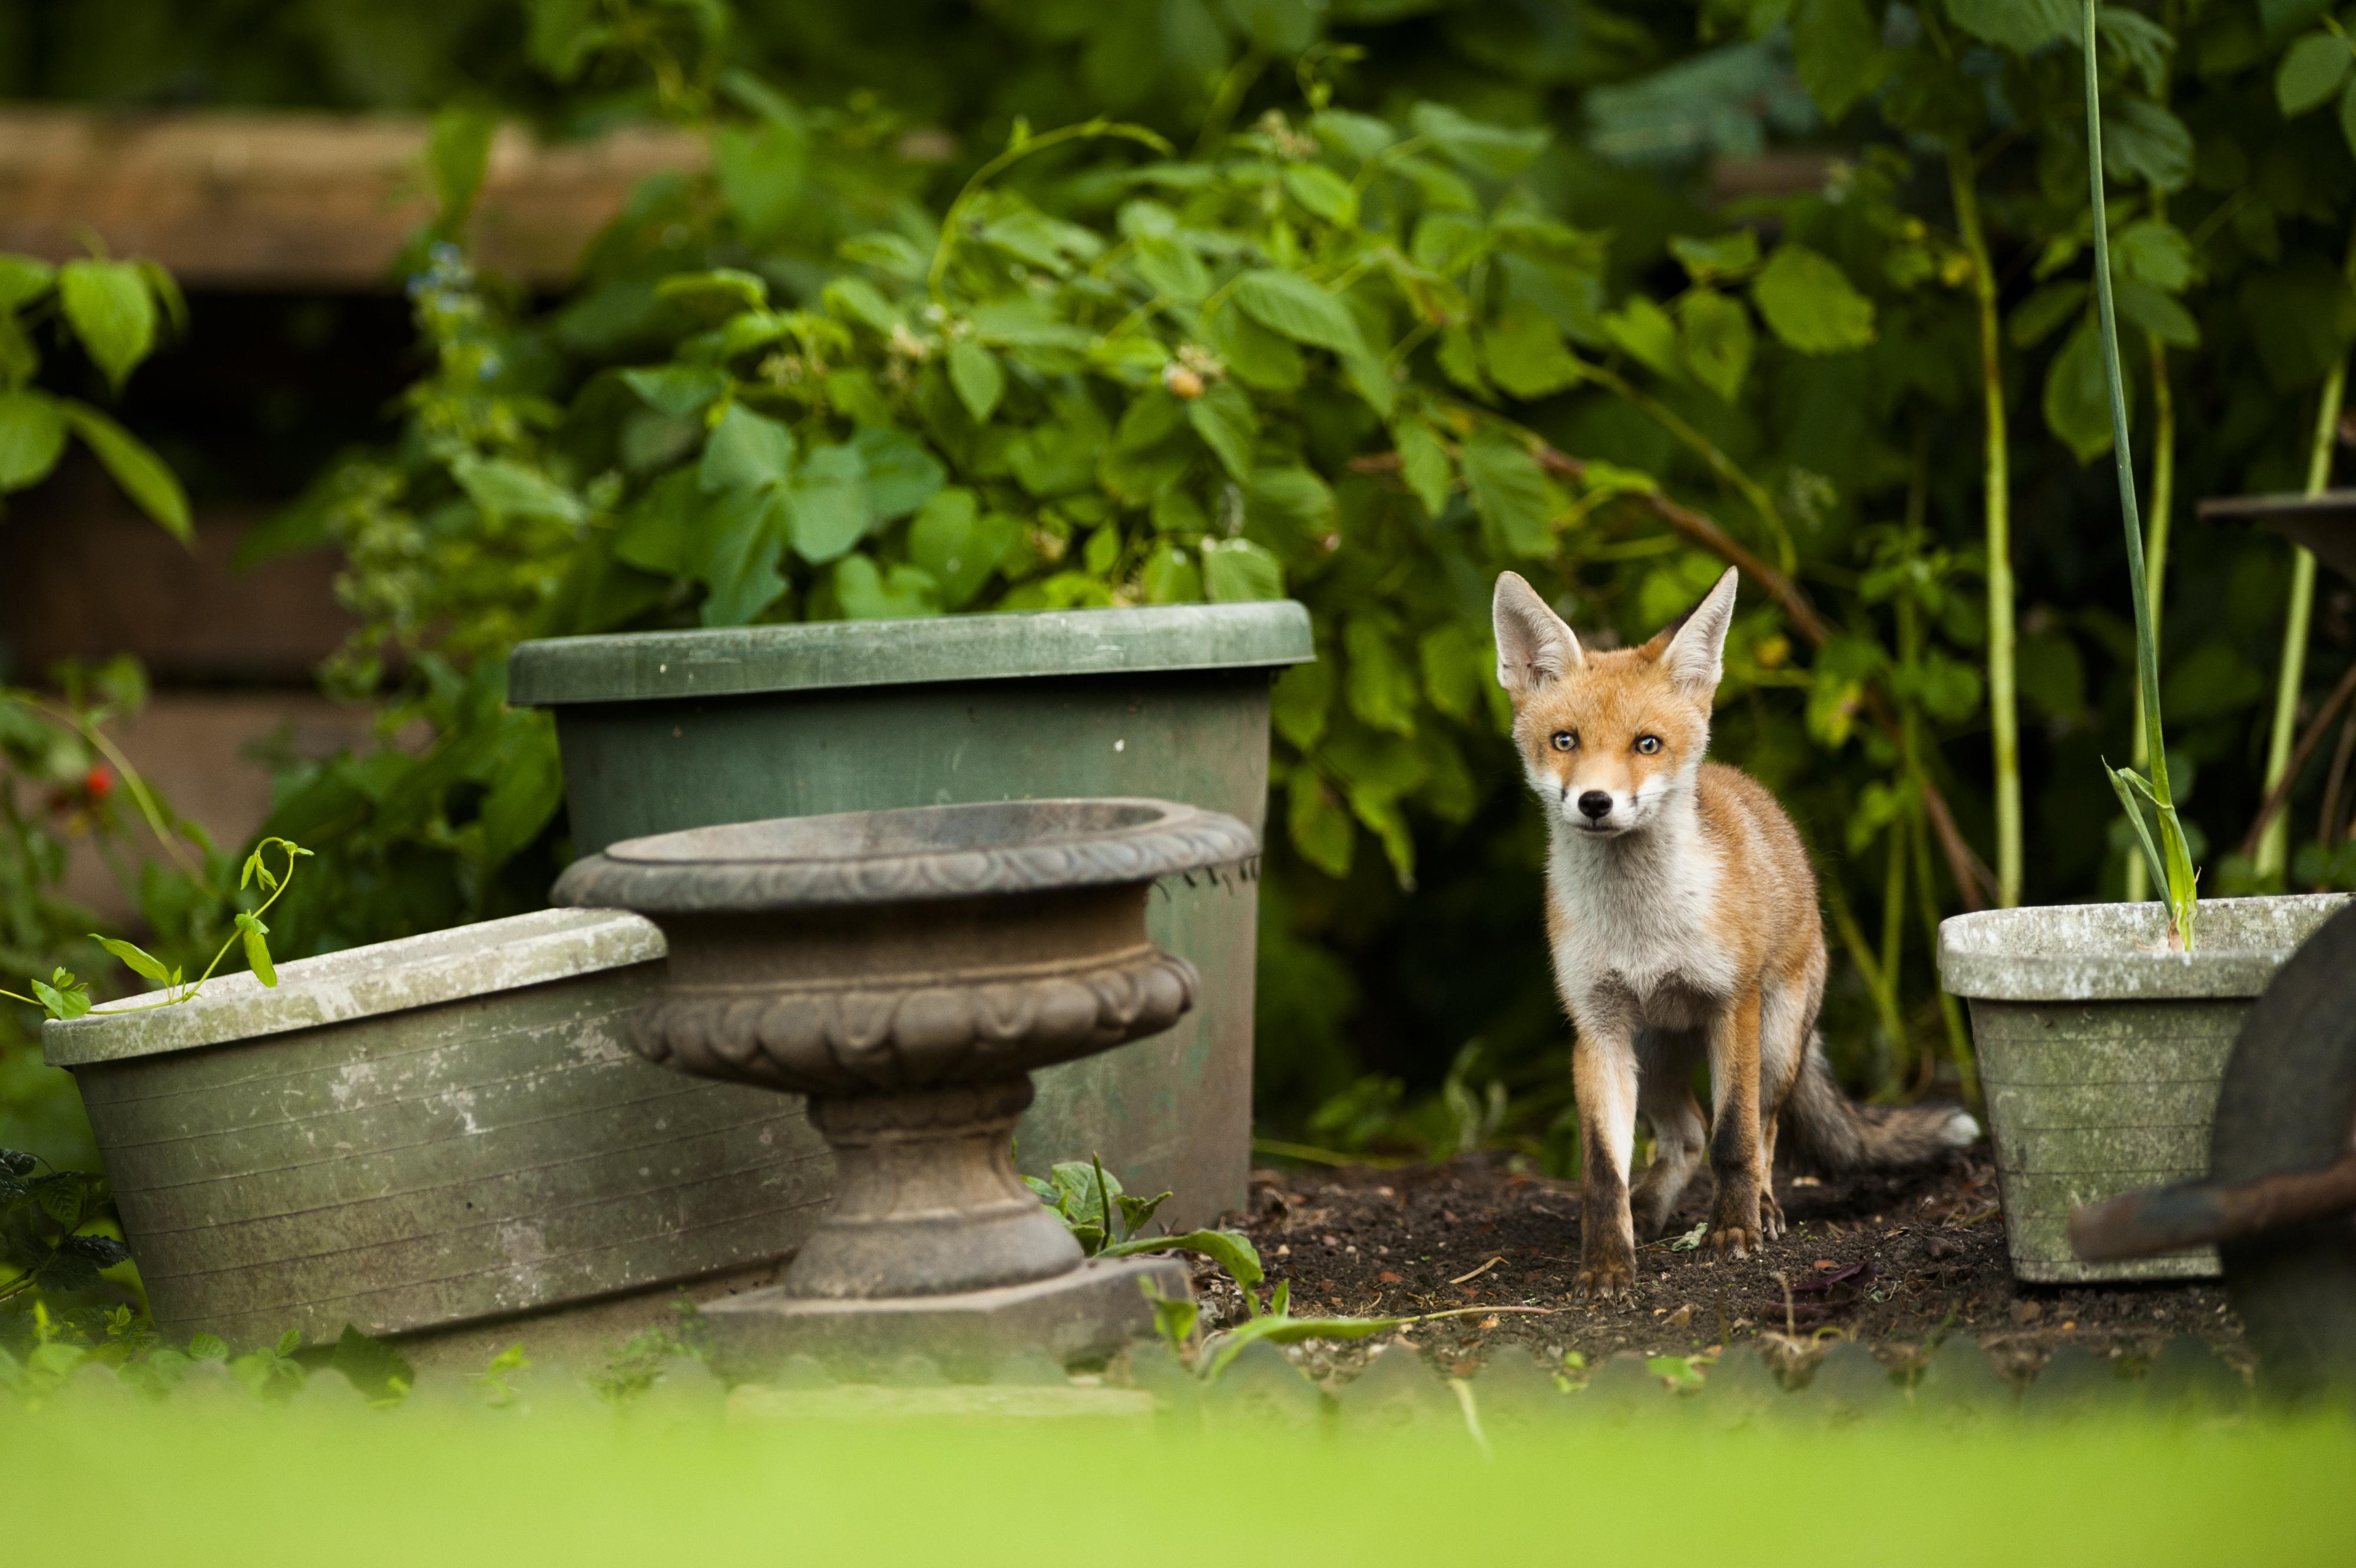 An urban fox in a suburban garden